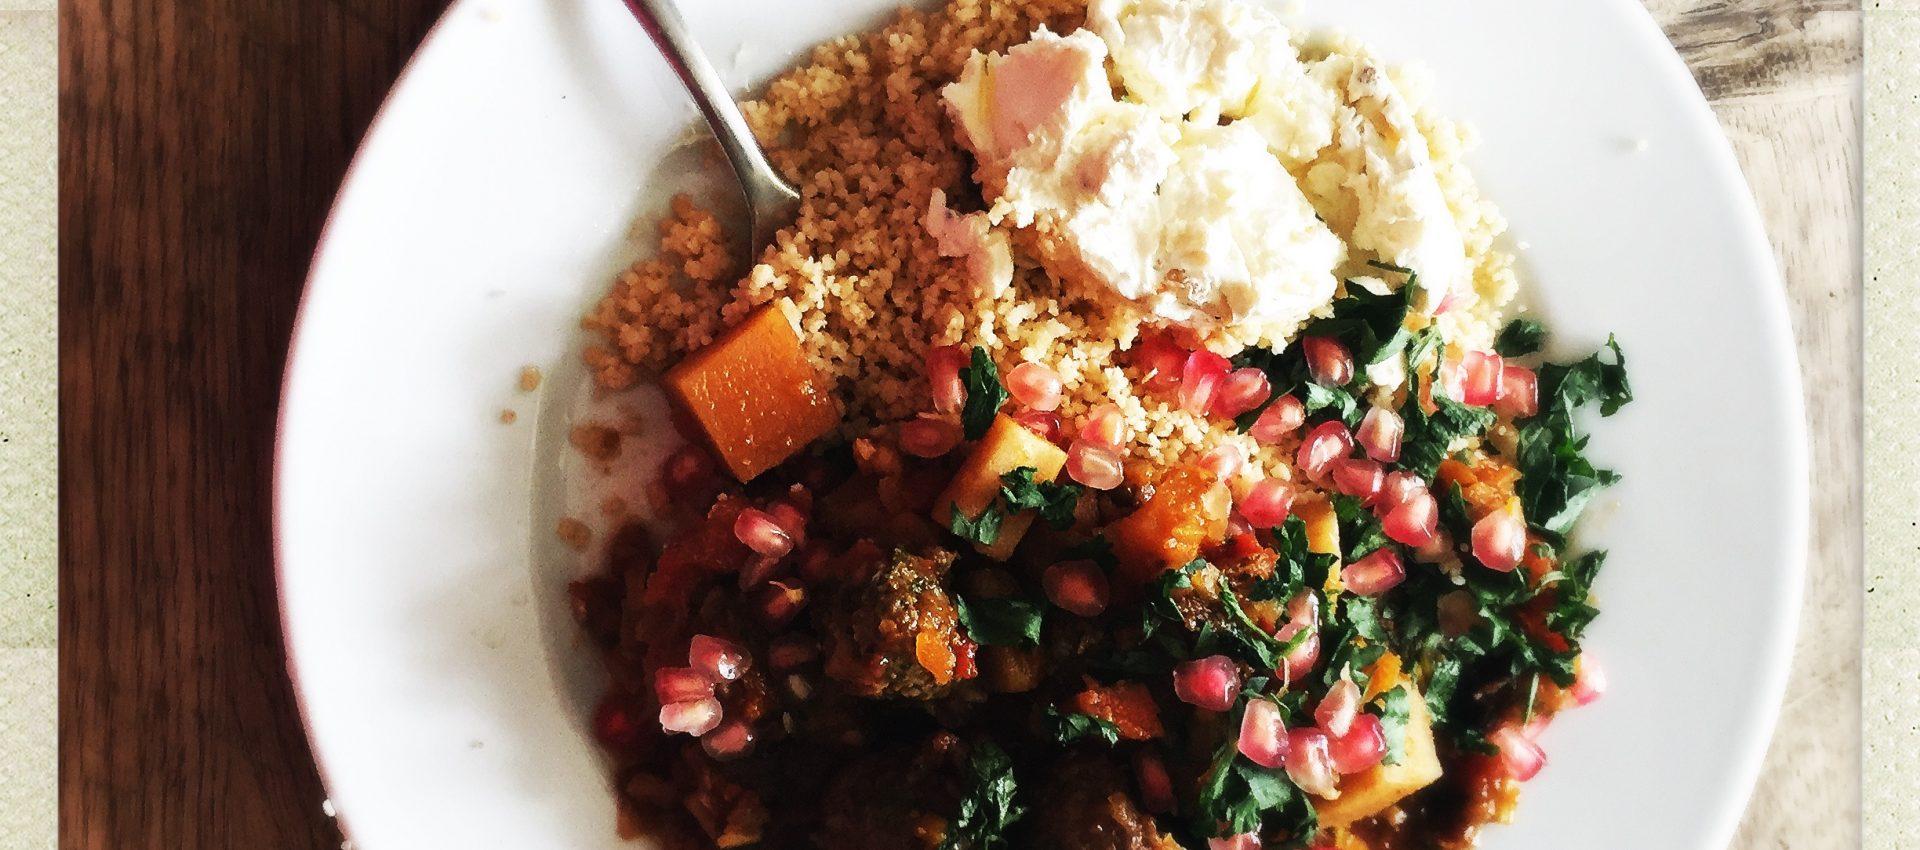 Winter veg casserole with labneh